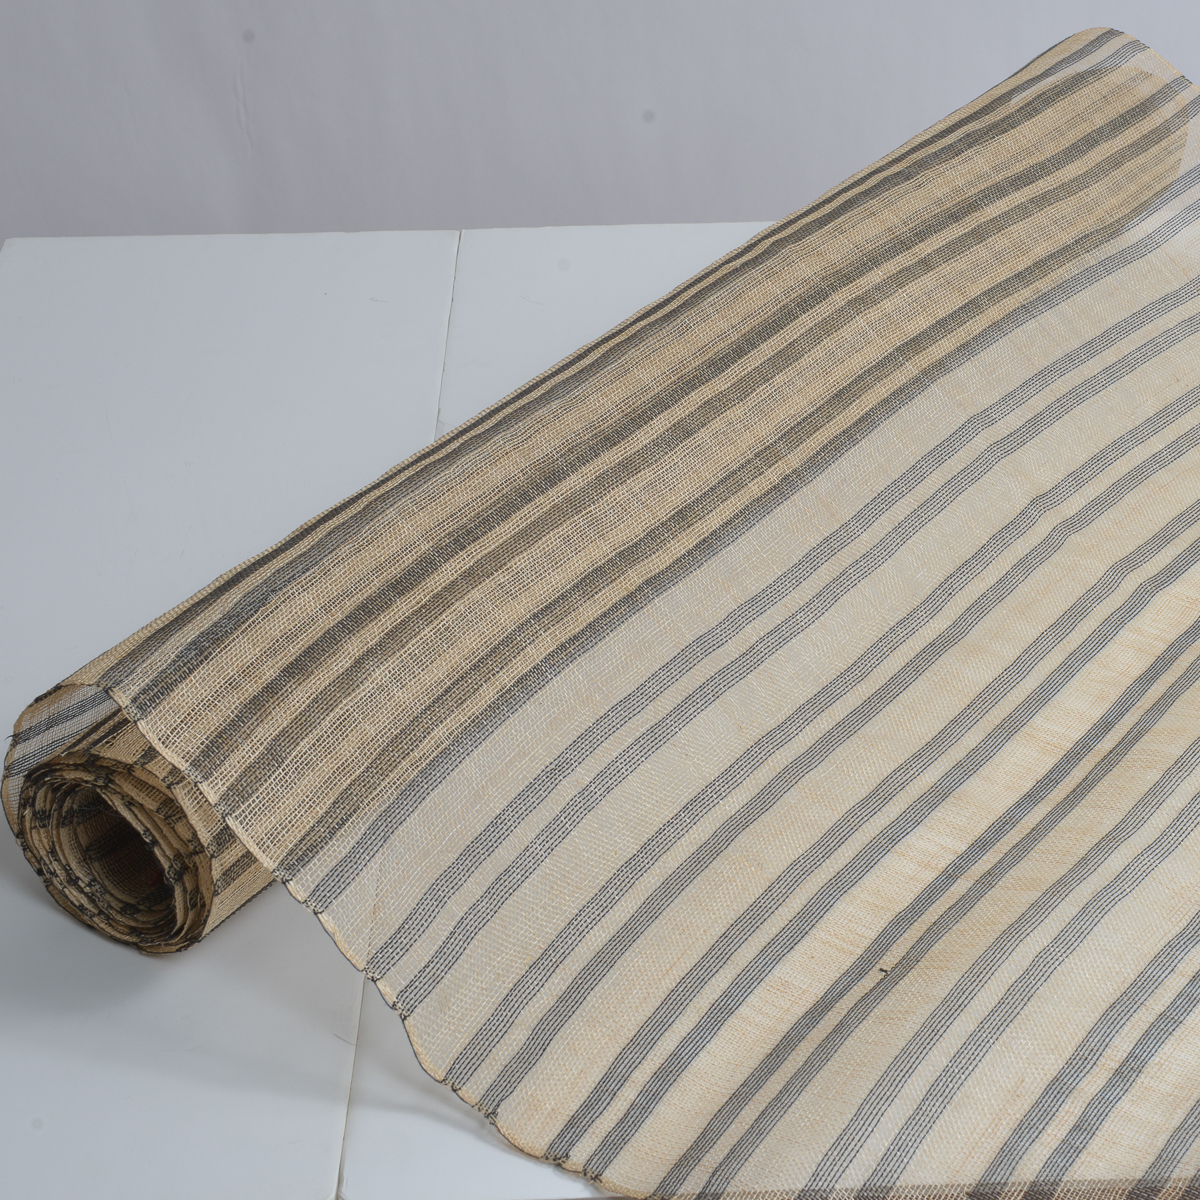 Natural-Black Thread Pattern Heavy Sizing Sinamay Fabric-SHSP001S-80.12-Sun  Yorkos  7c6135fa5b2